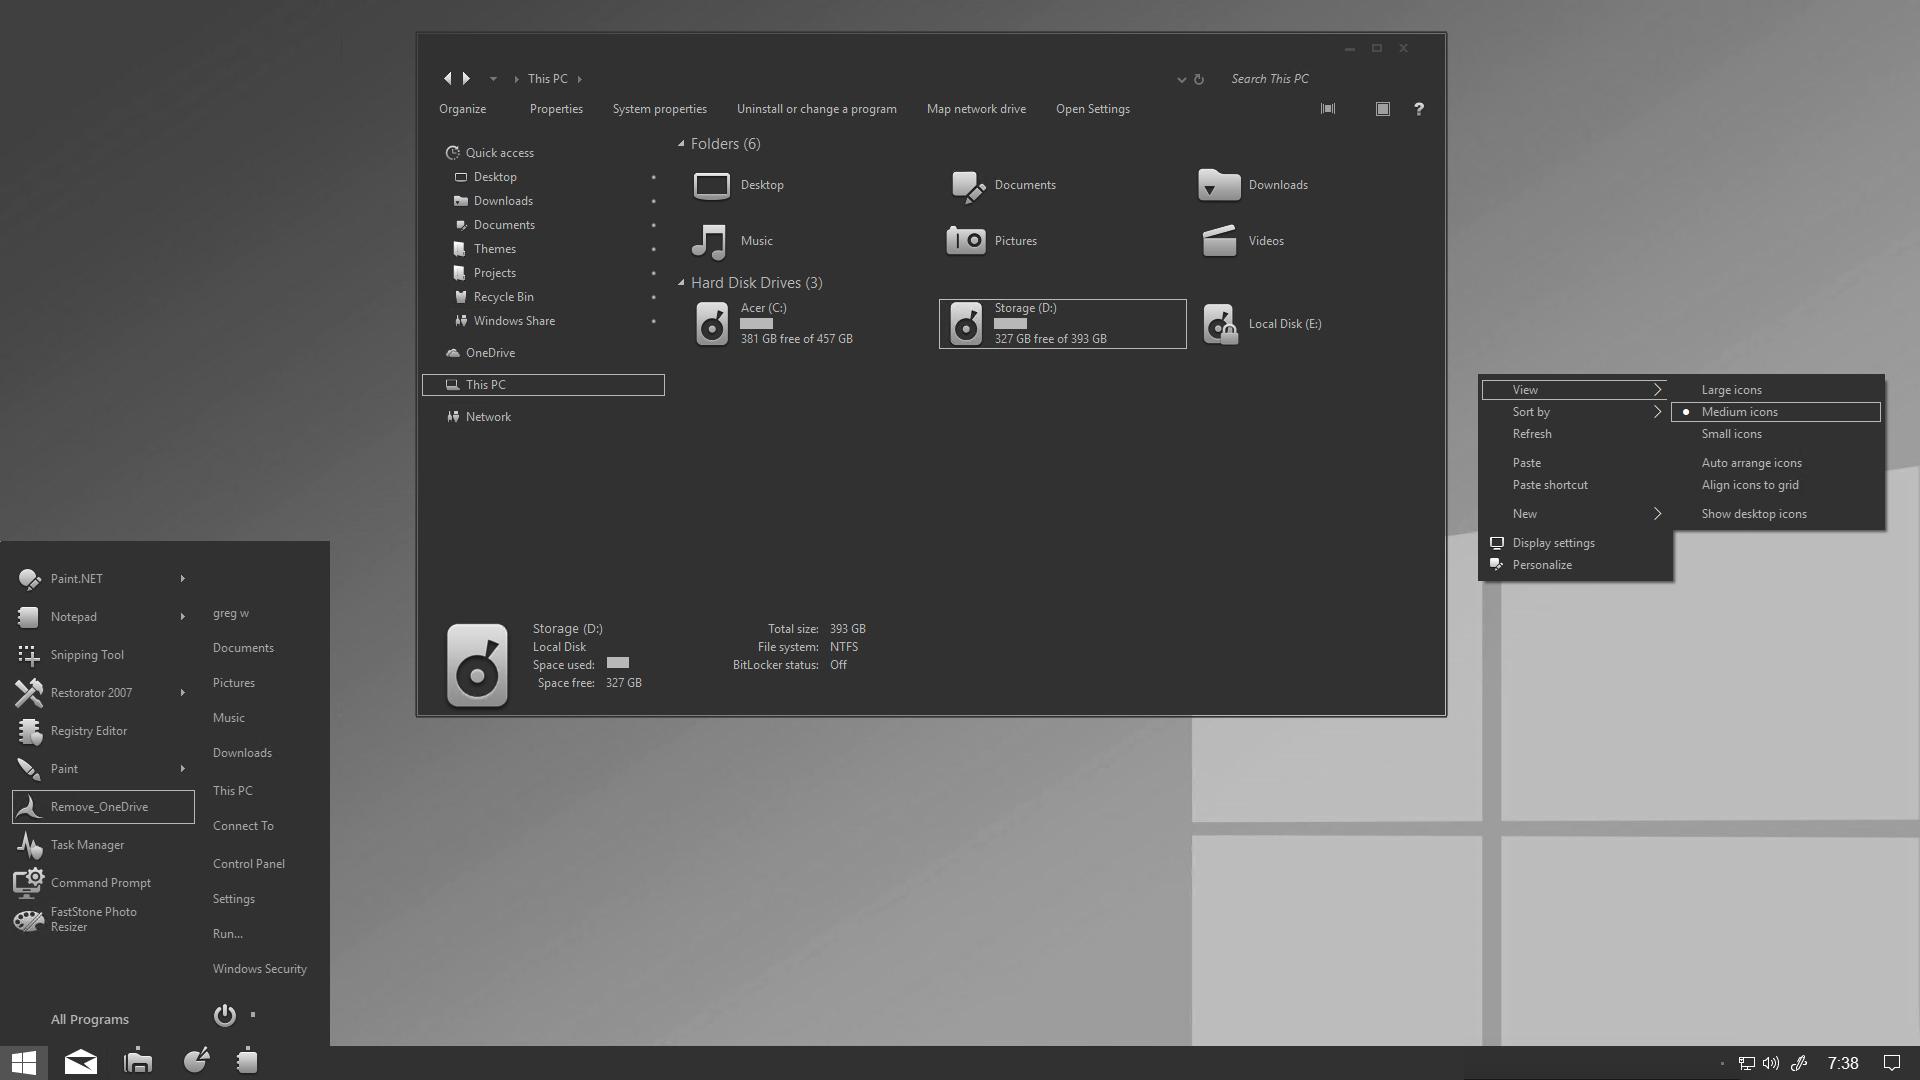 Grey mode for Windows 10 -1809 by gsw953onDA